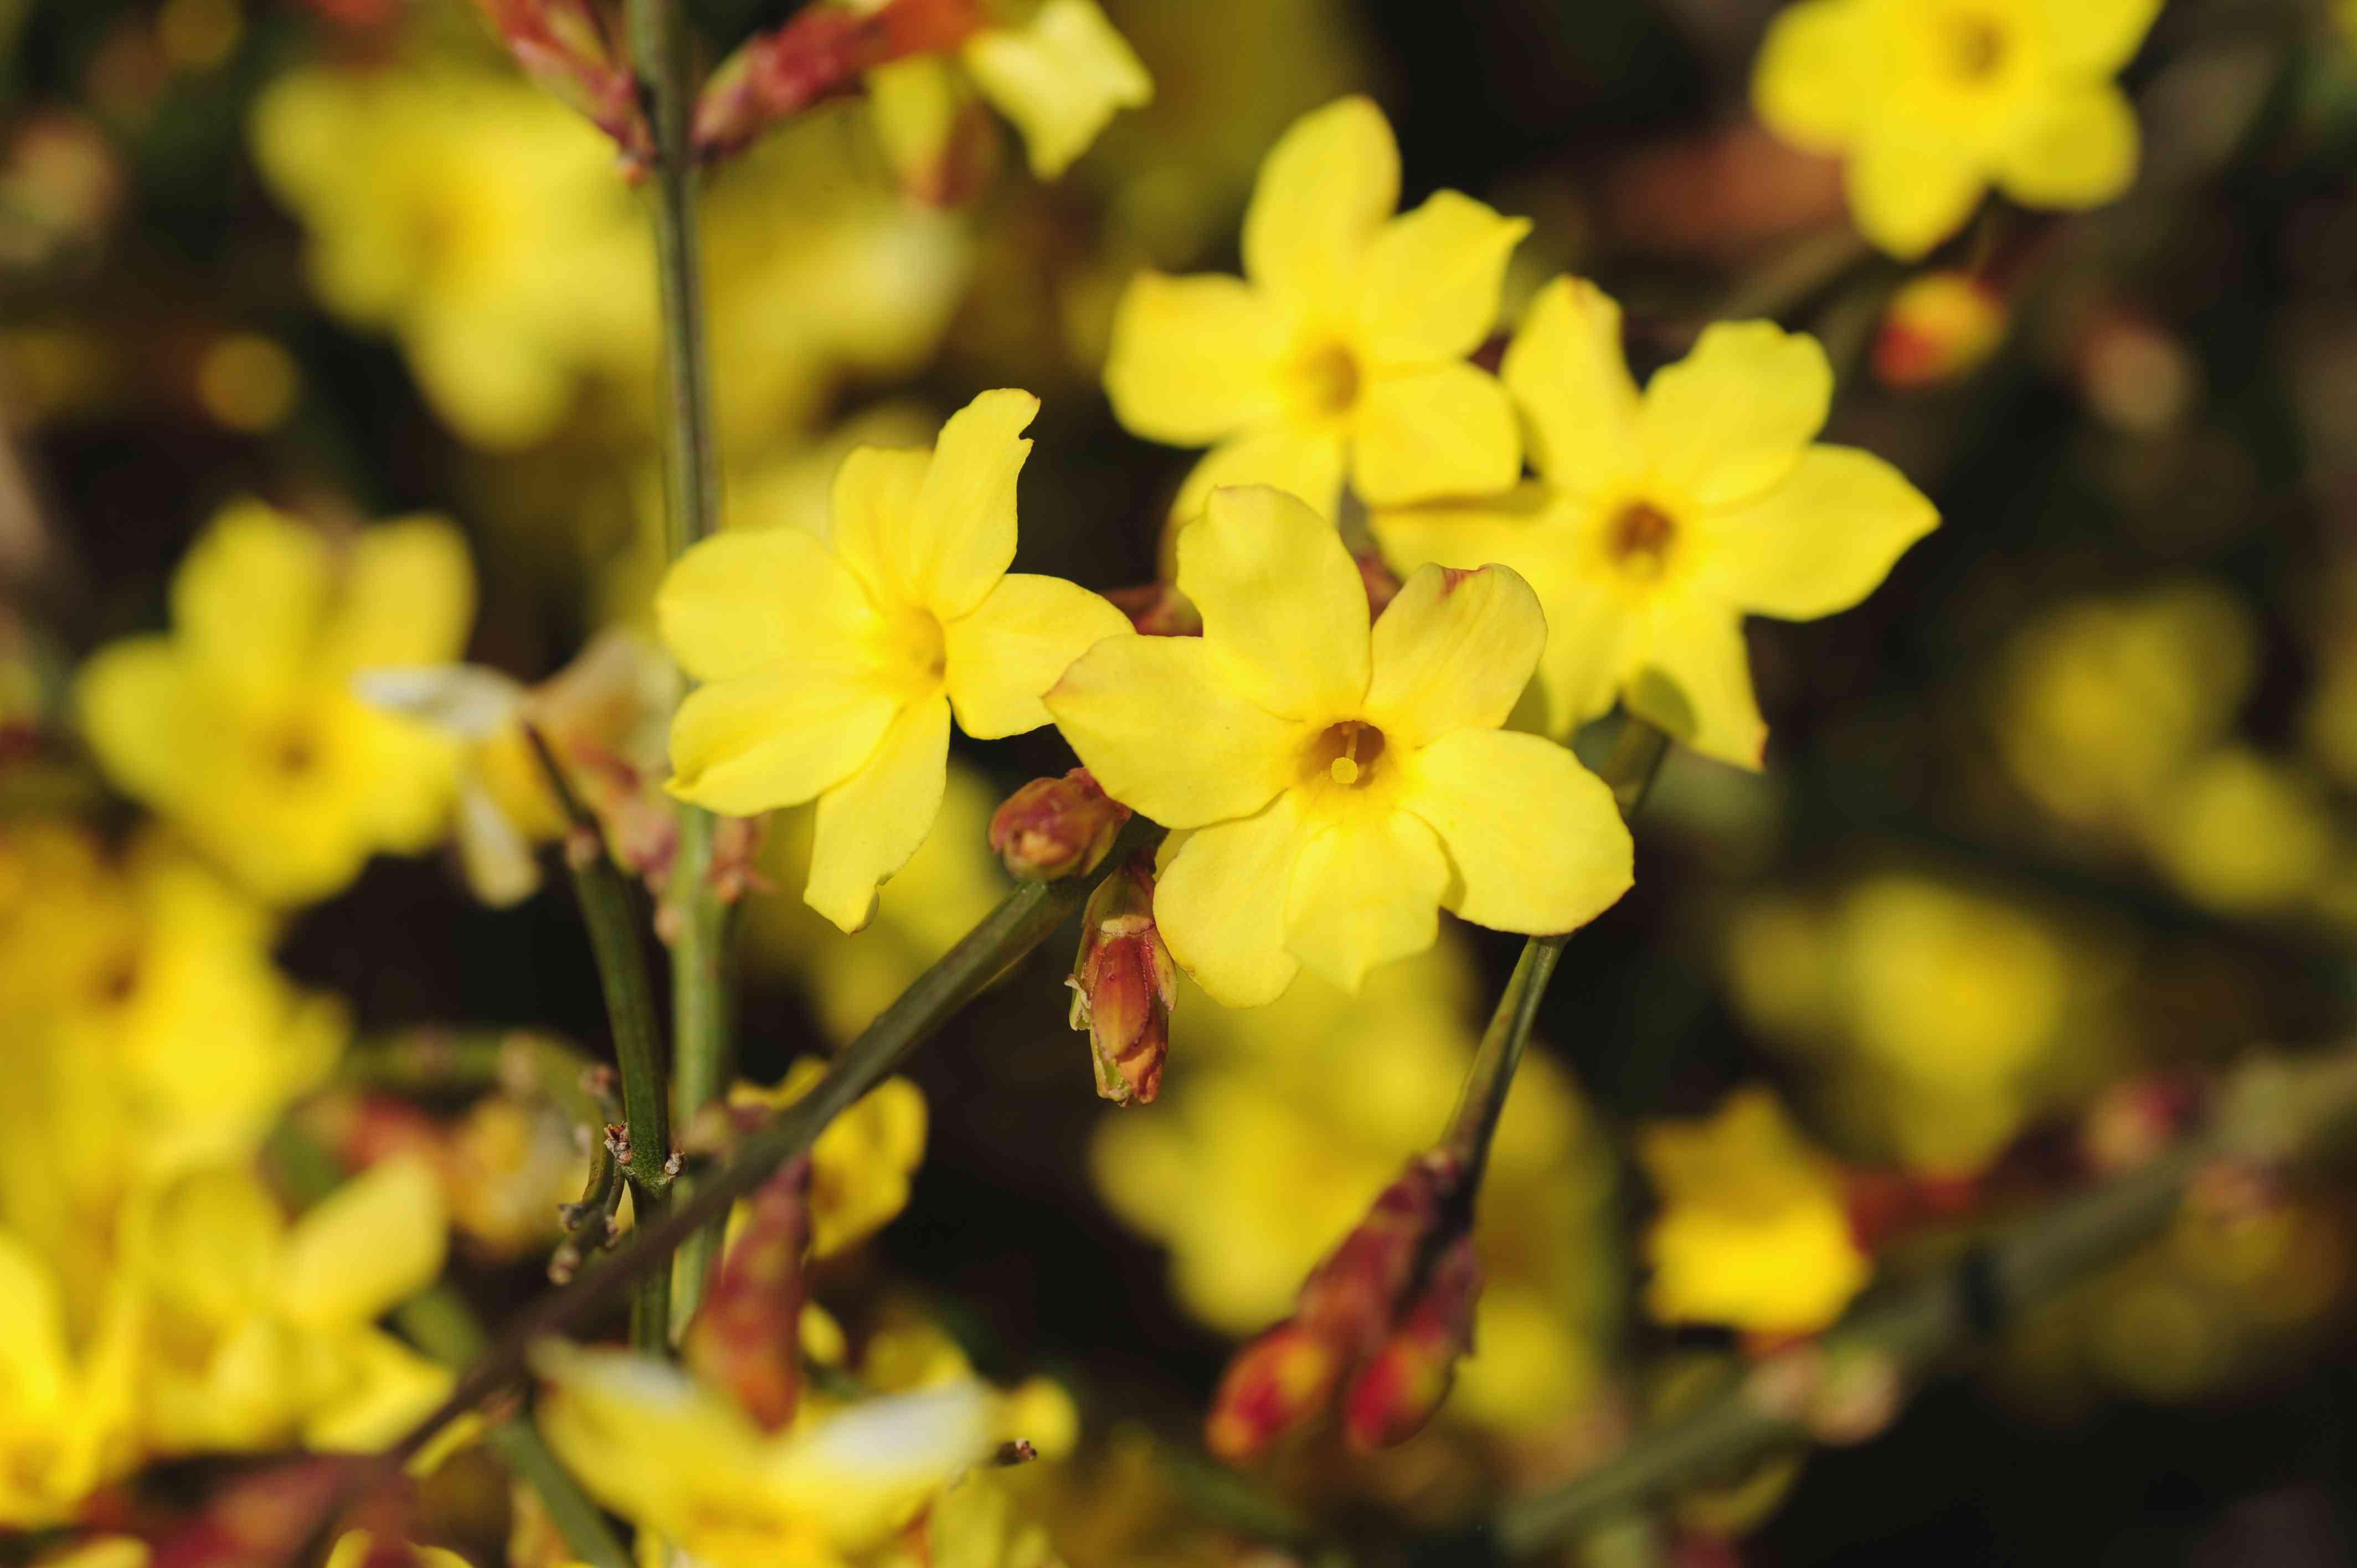 Winter jasmine yellow flowers and buds on vine closeup